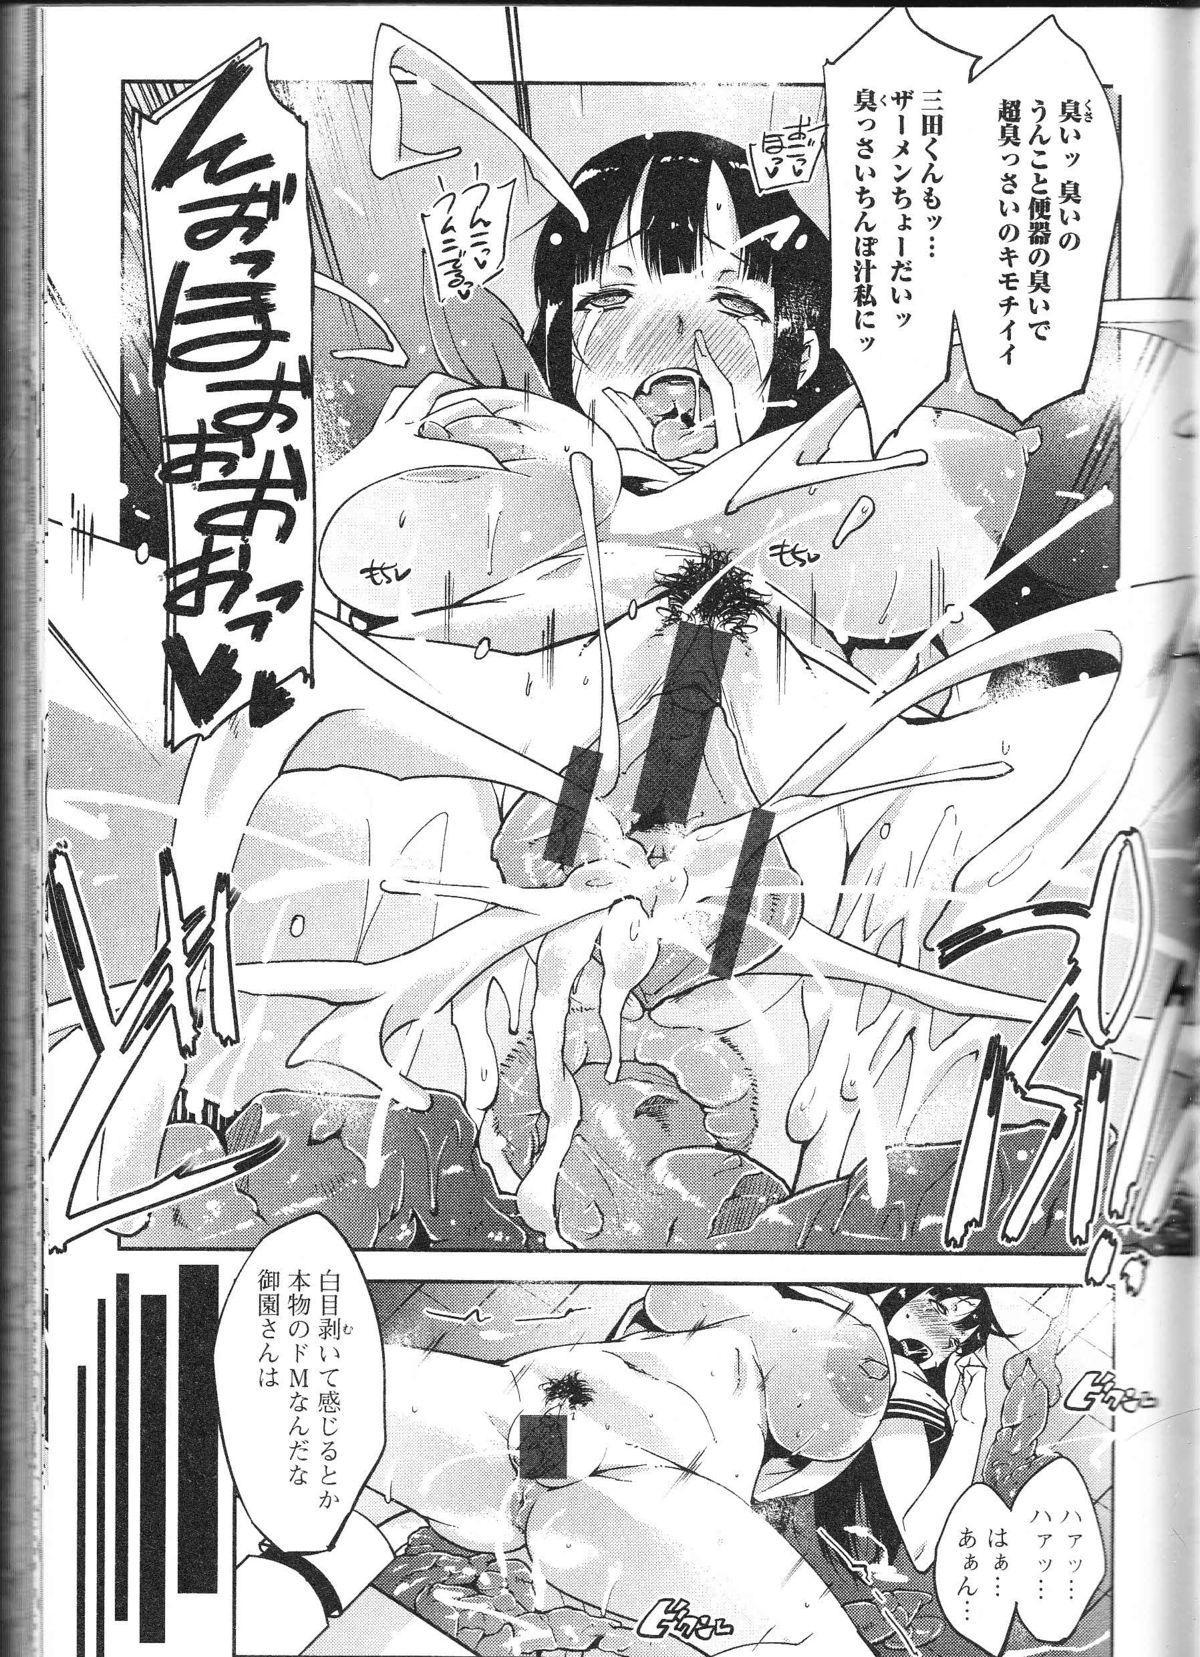 Nozoite wa Ikenai 9 - Do Not Peep! 9 85